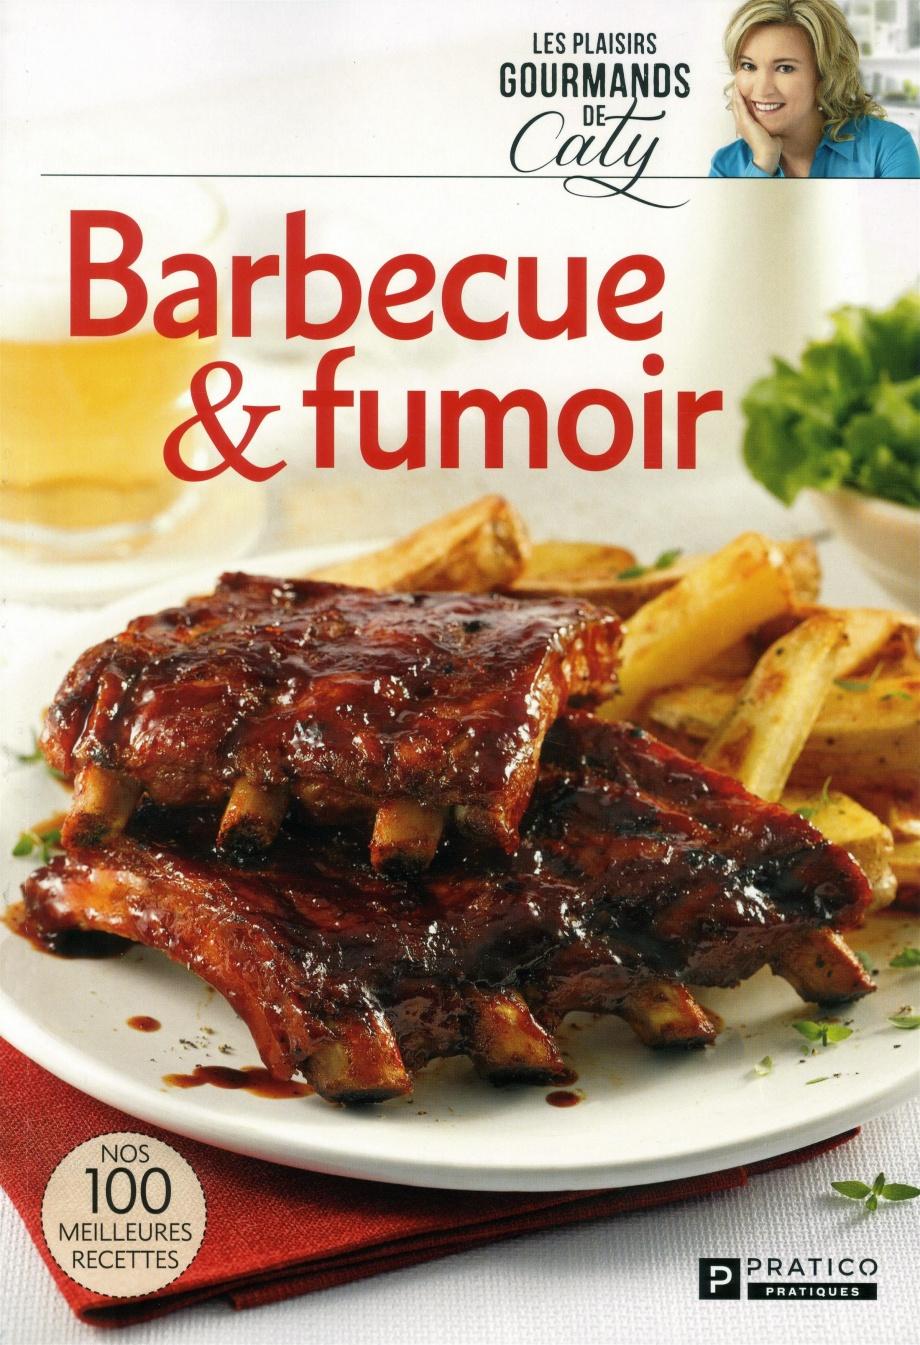 barbecue et fumoir par caty b rub cuisine bbq plancha cuisine d 39 t. Black Bedroom Furniture Sets. Home Design Ideas